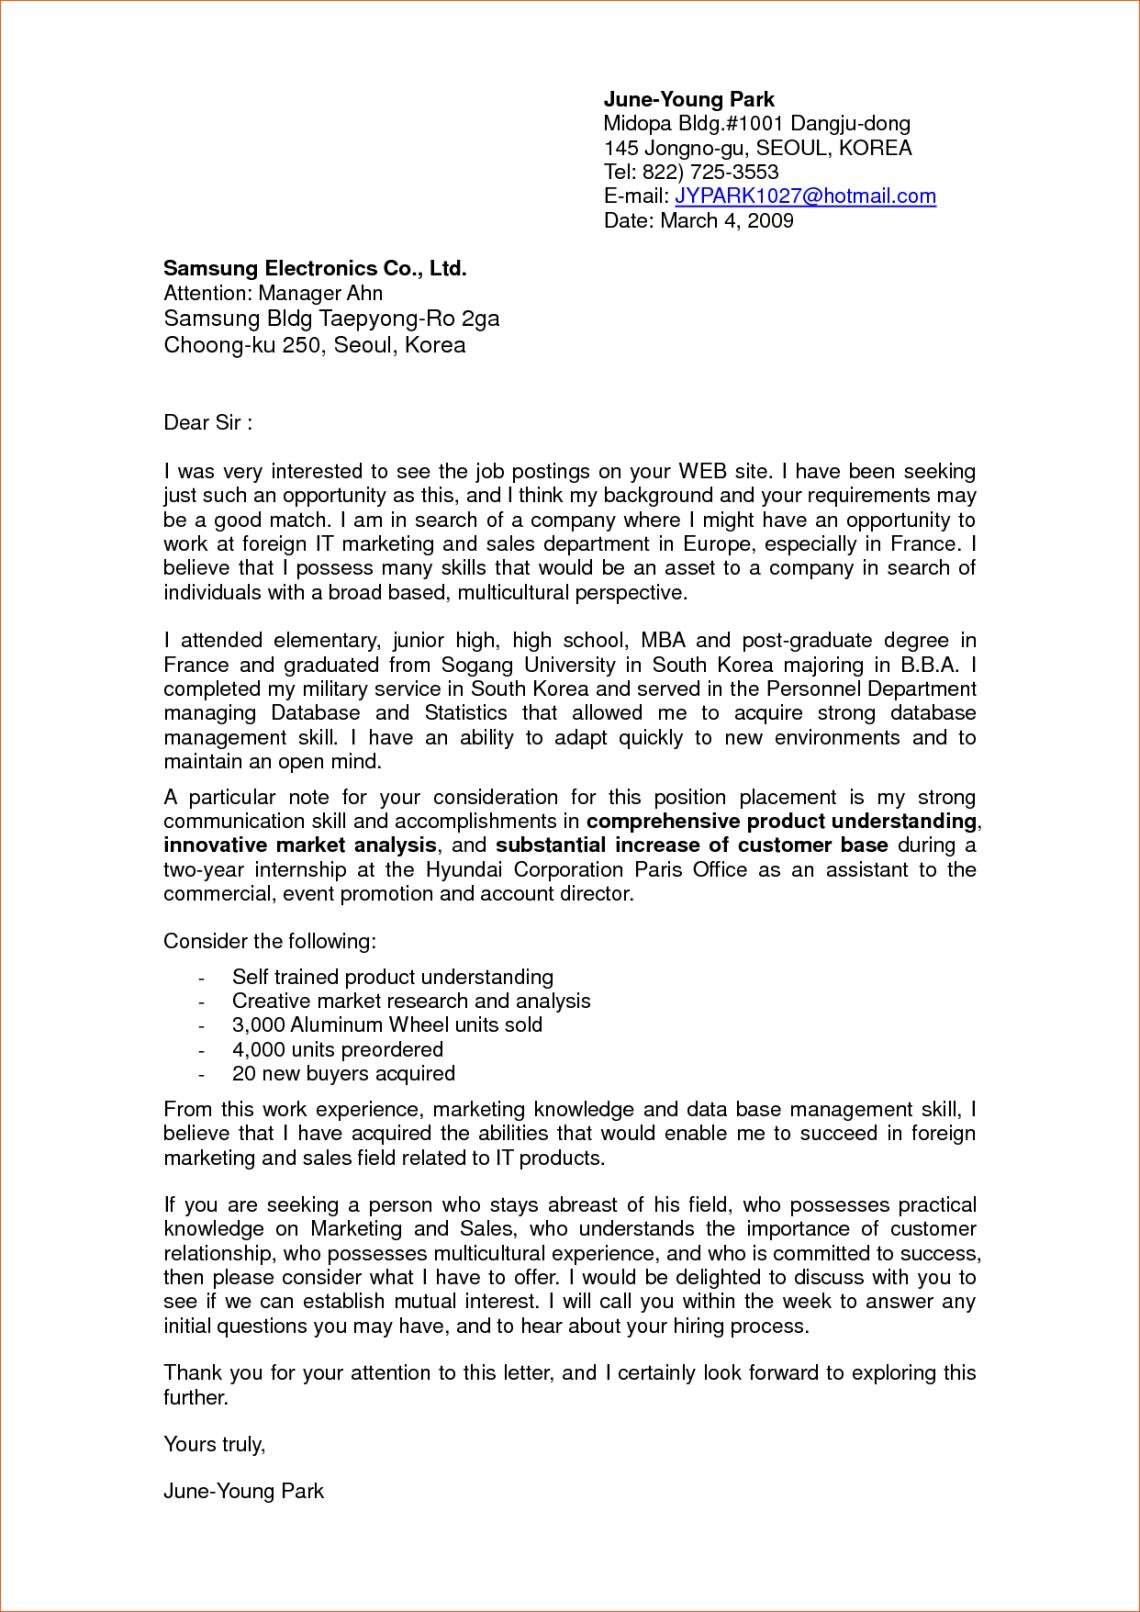 004 Essay Example Self Introduction Letter 4693546resize11402c1612 Wonderful Sample Pdf For Job University Full